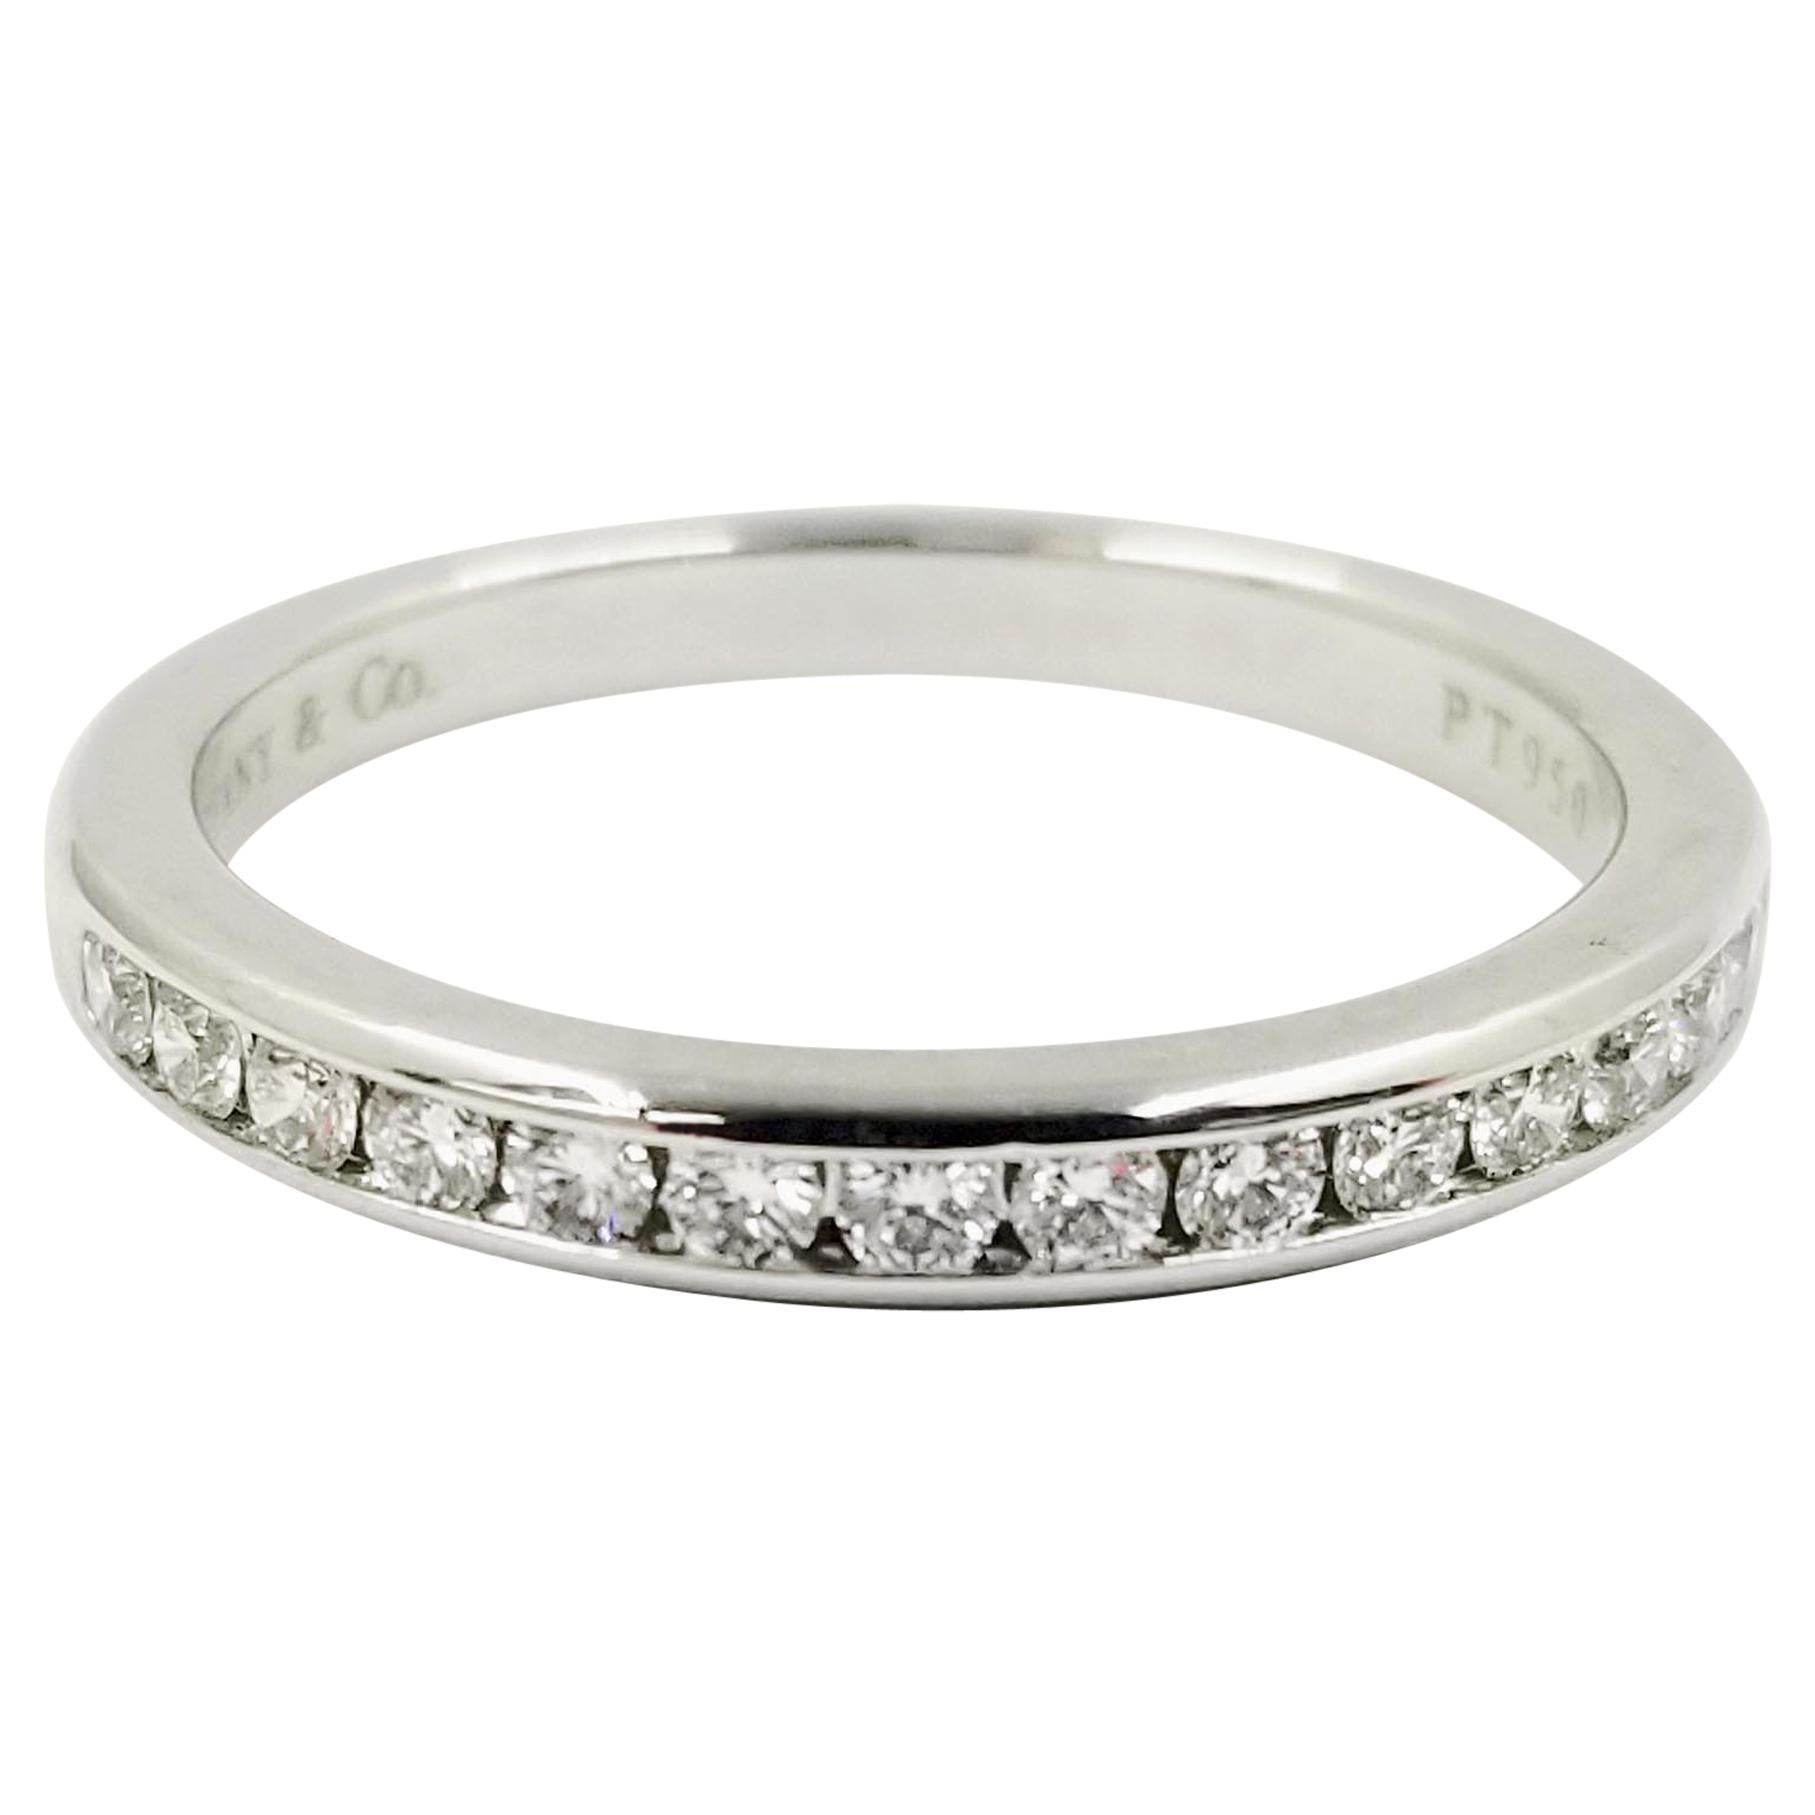 Platinum Tiffany & Co. Channel Set Round Diamond Band Ring